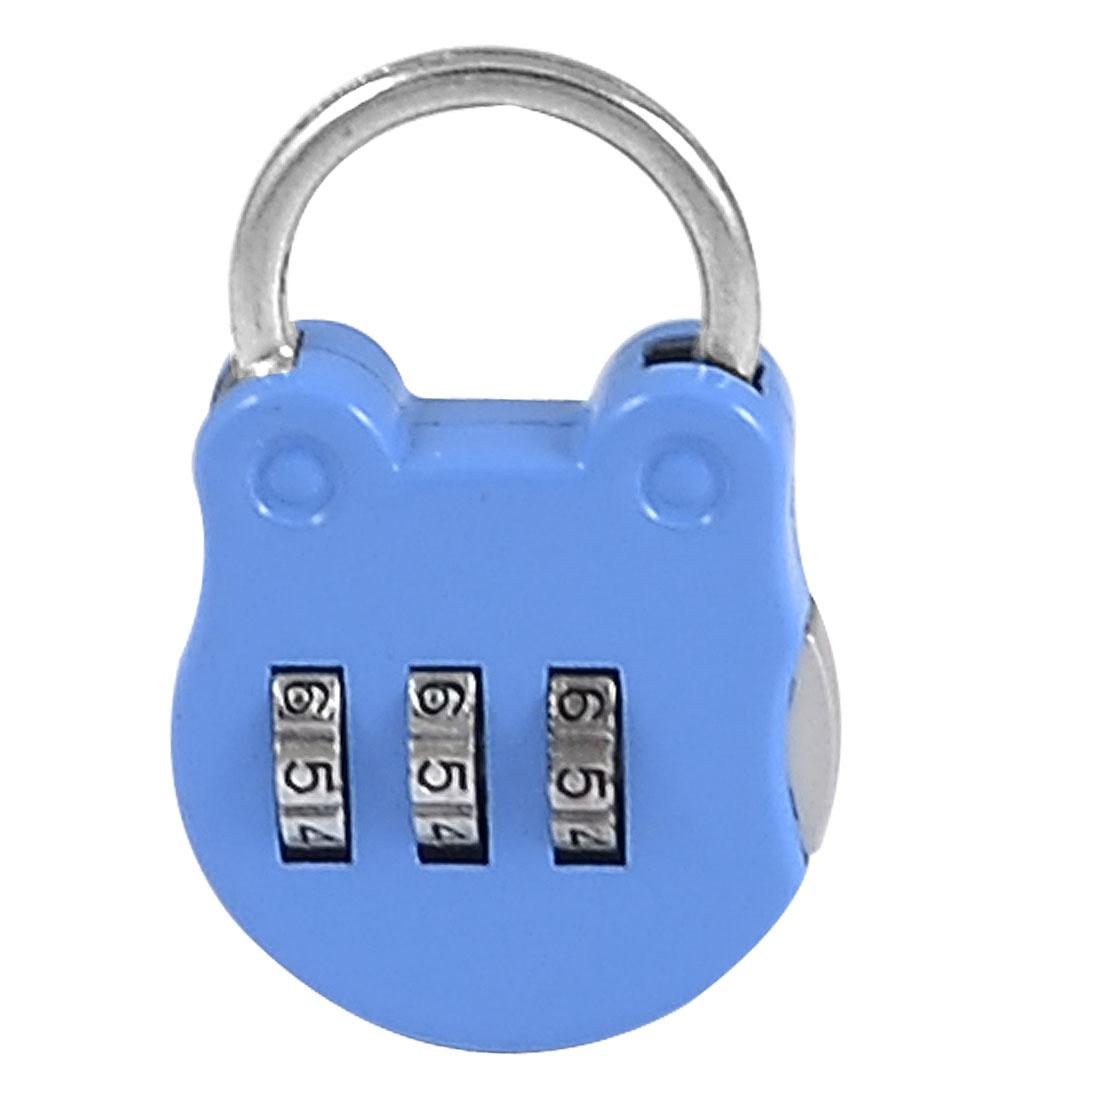 Light Blue Handbag Shaped 3 Digit Safe Private Boxes Combination Lock Padlock